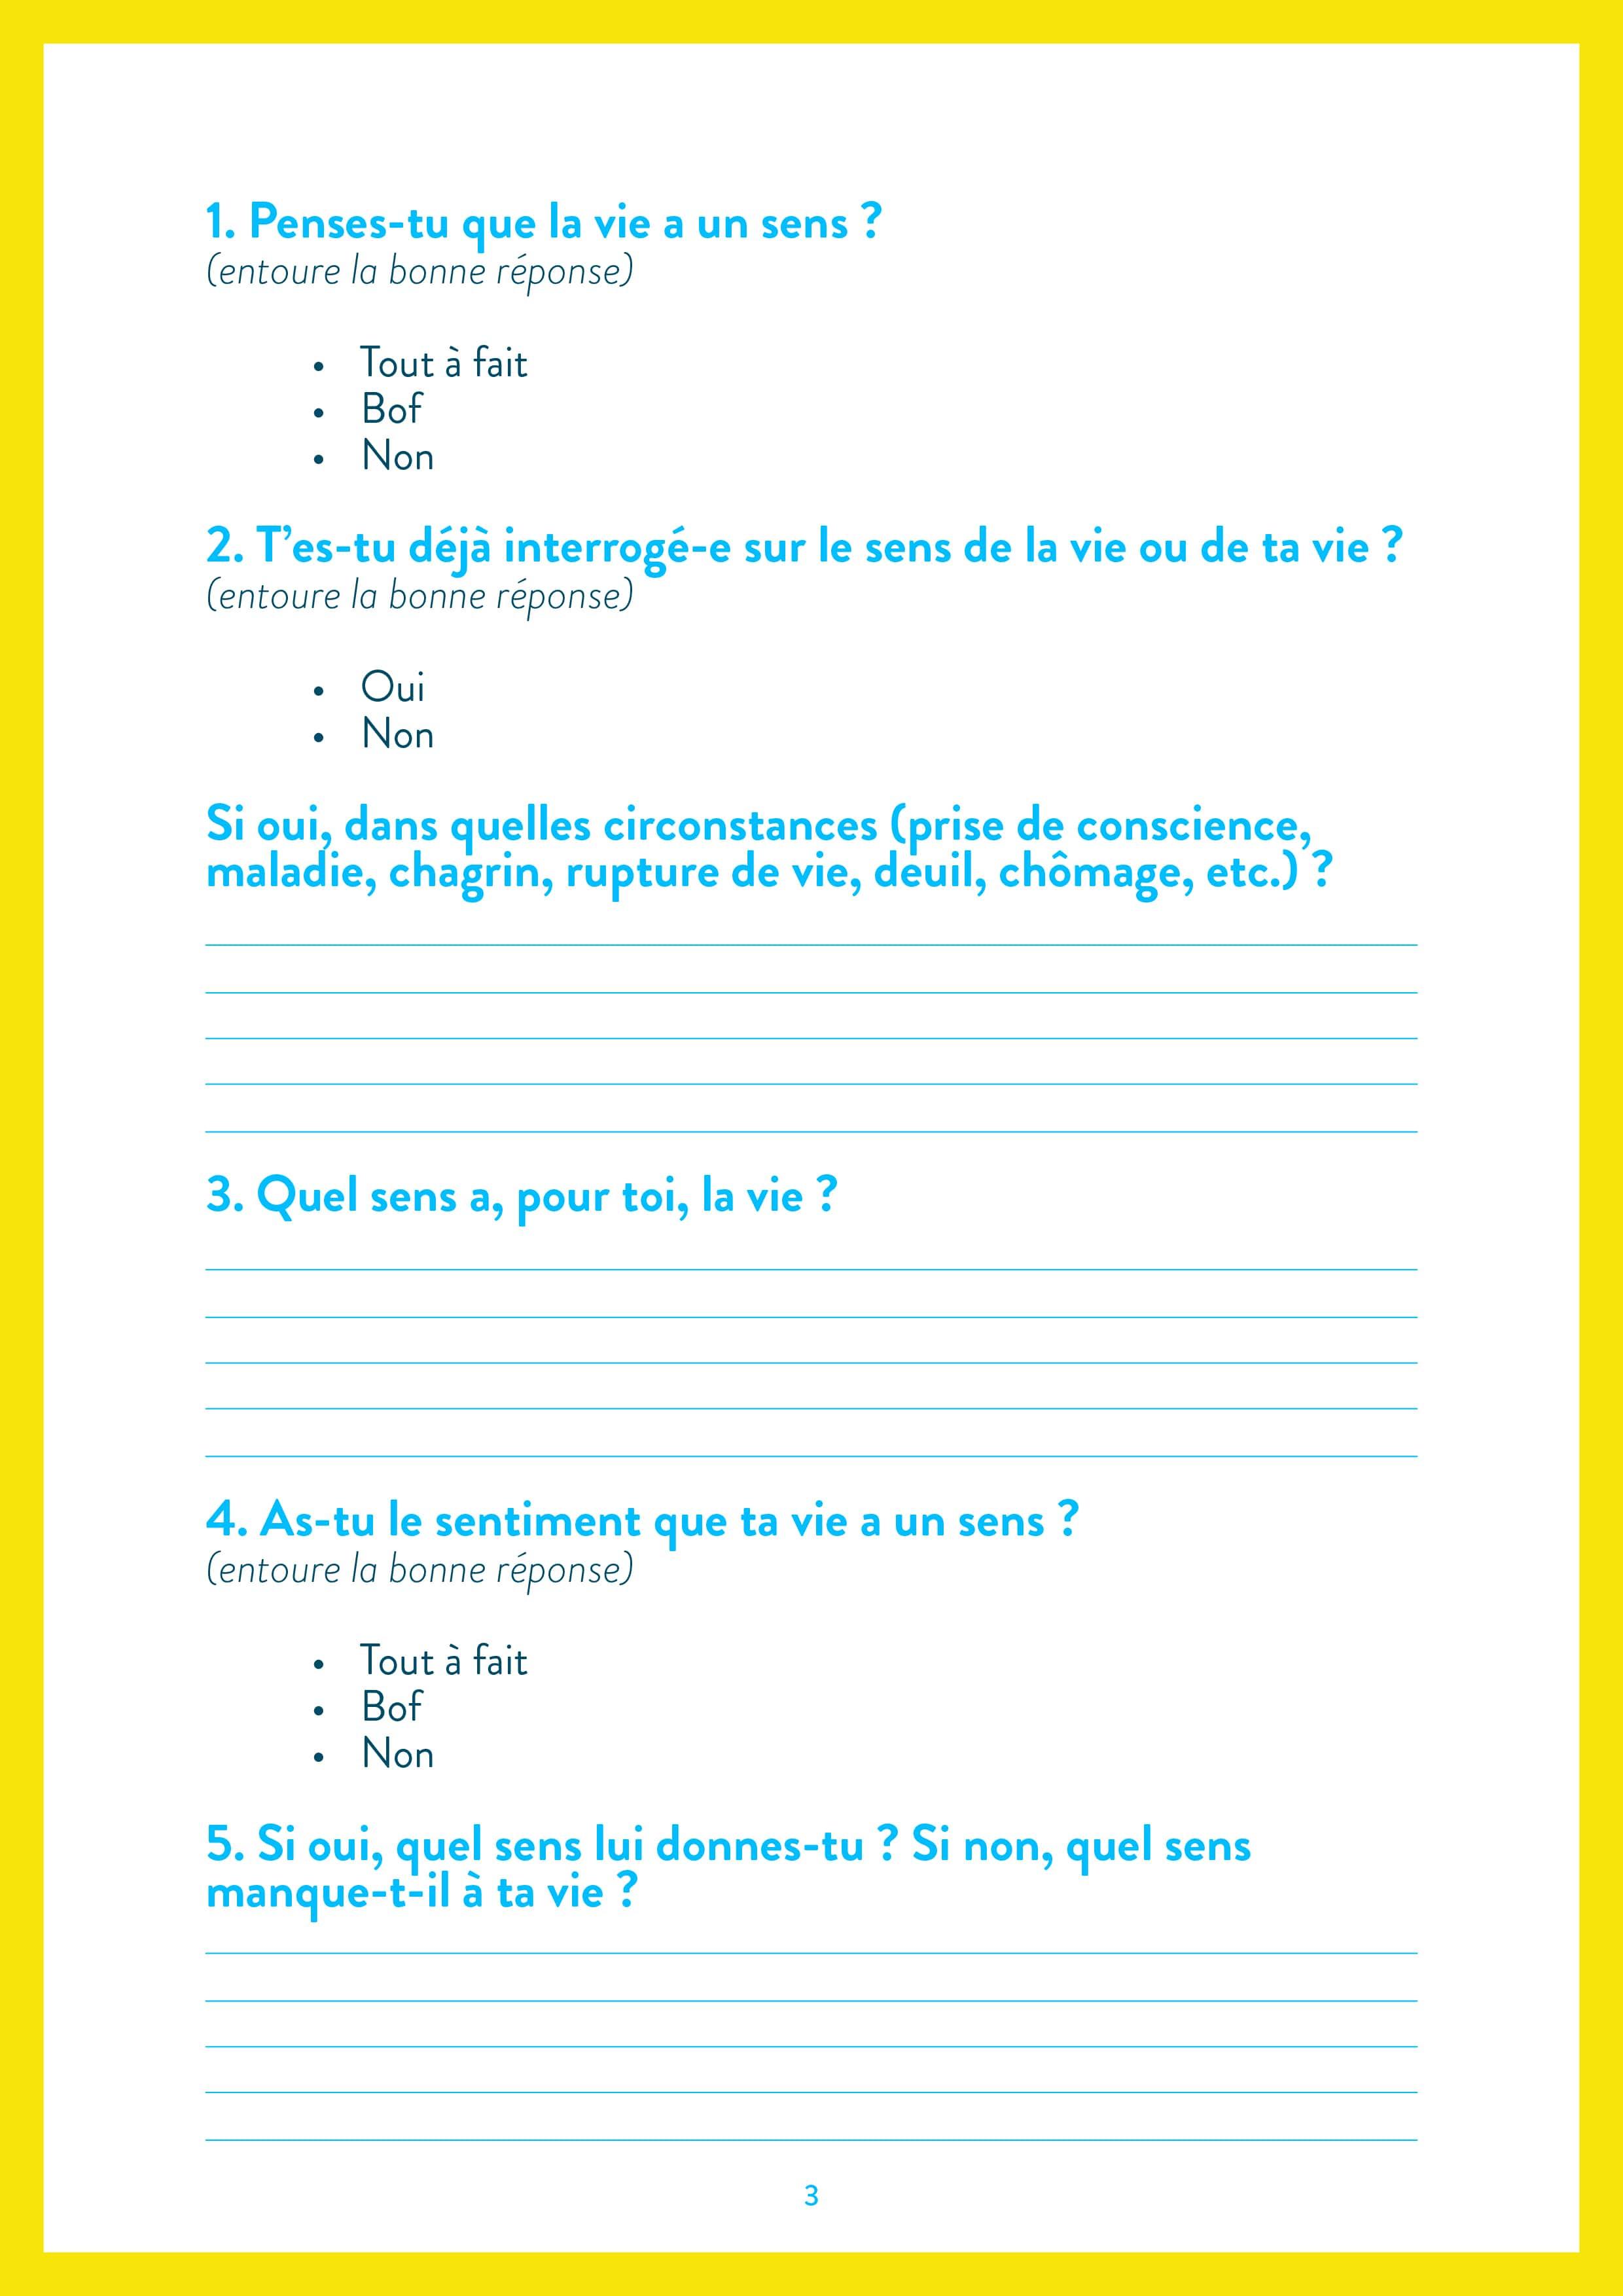 E-coaching-Cahierdexo-serie1-3.jpg